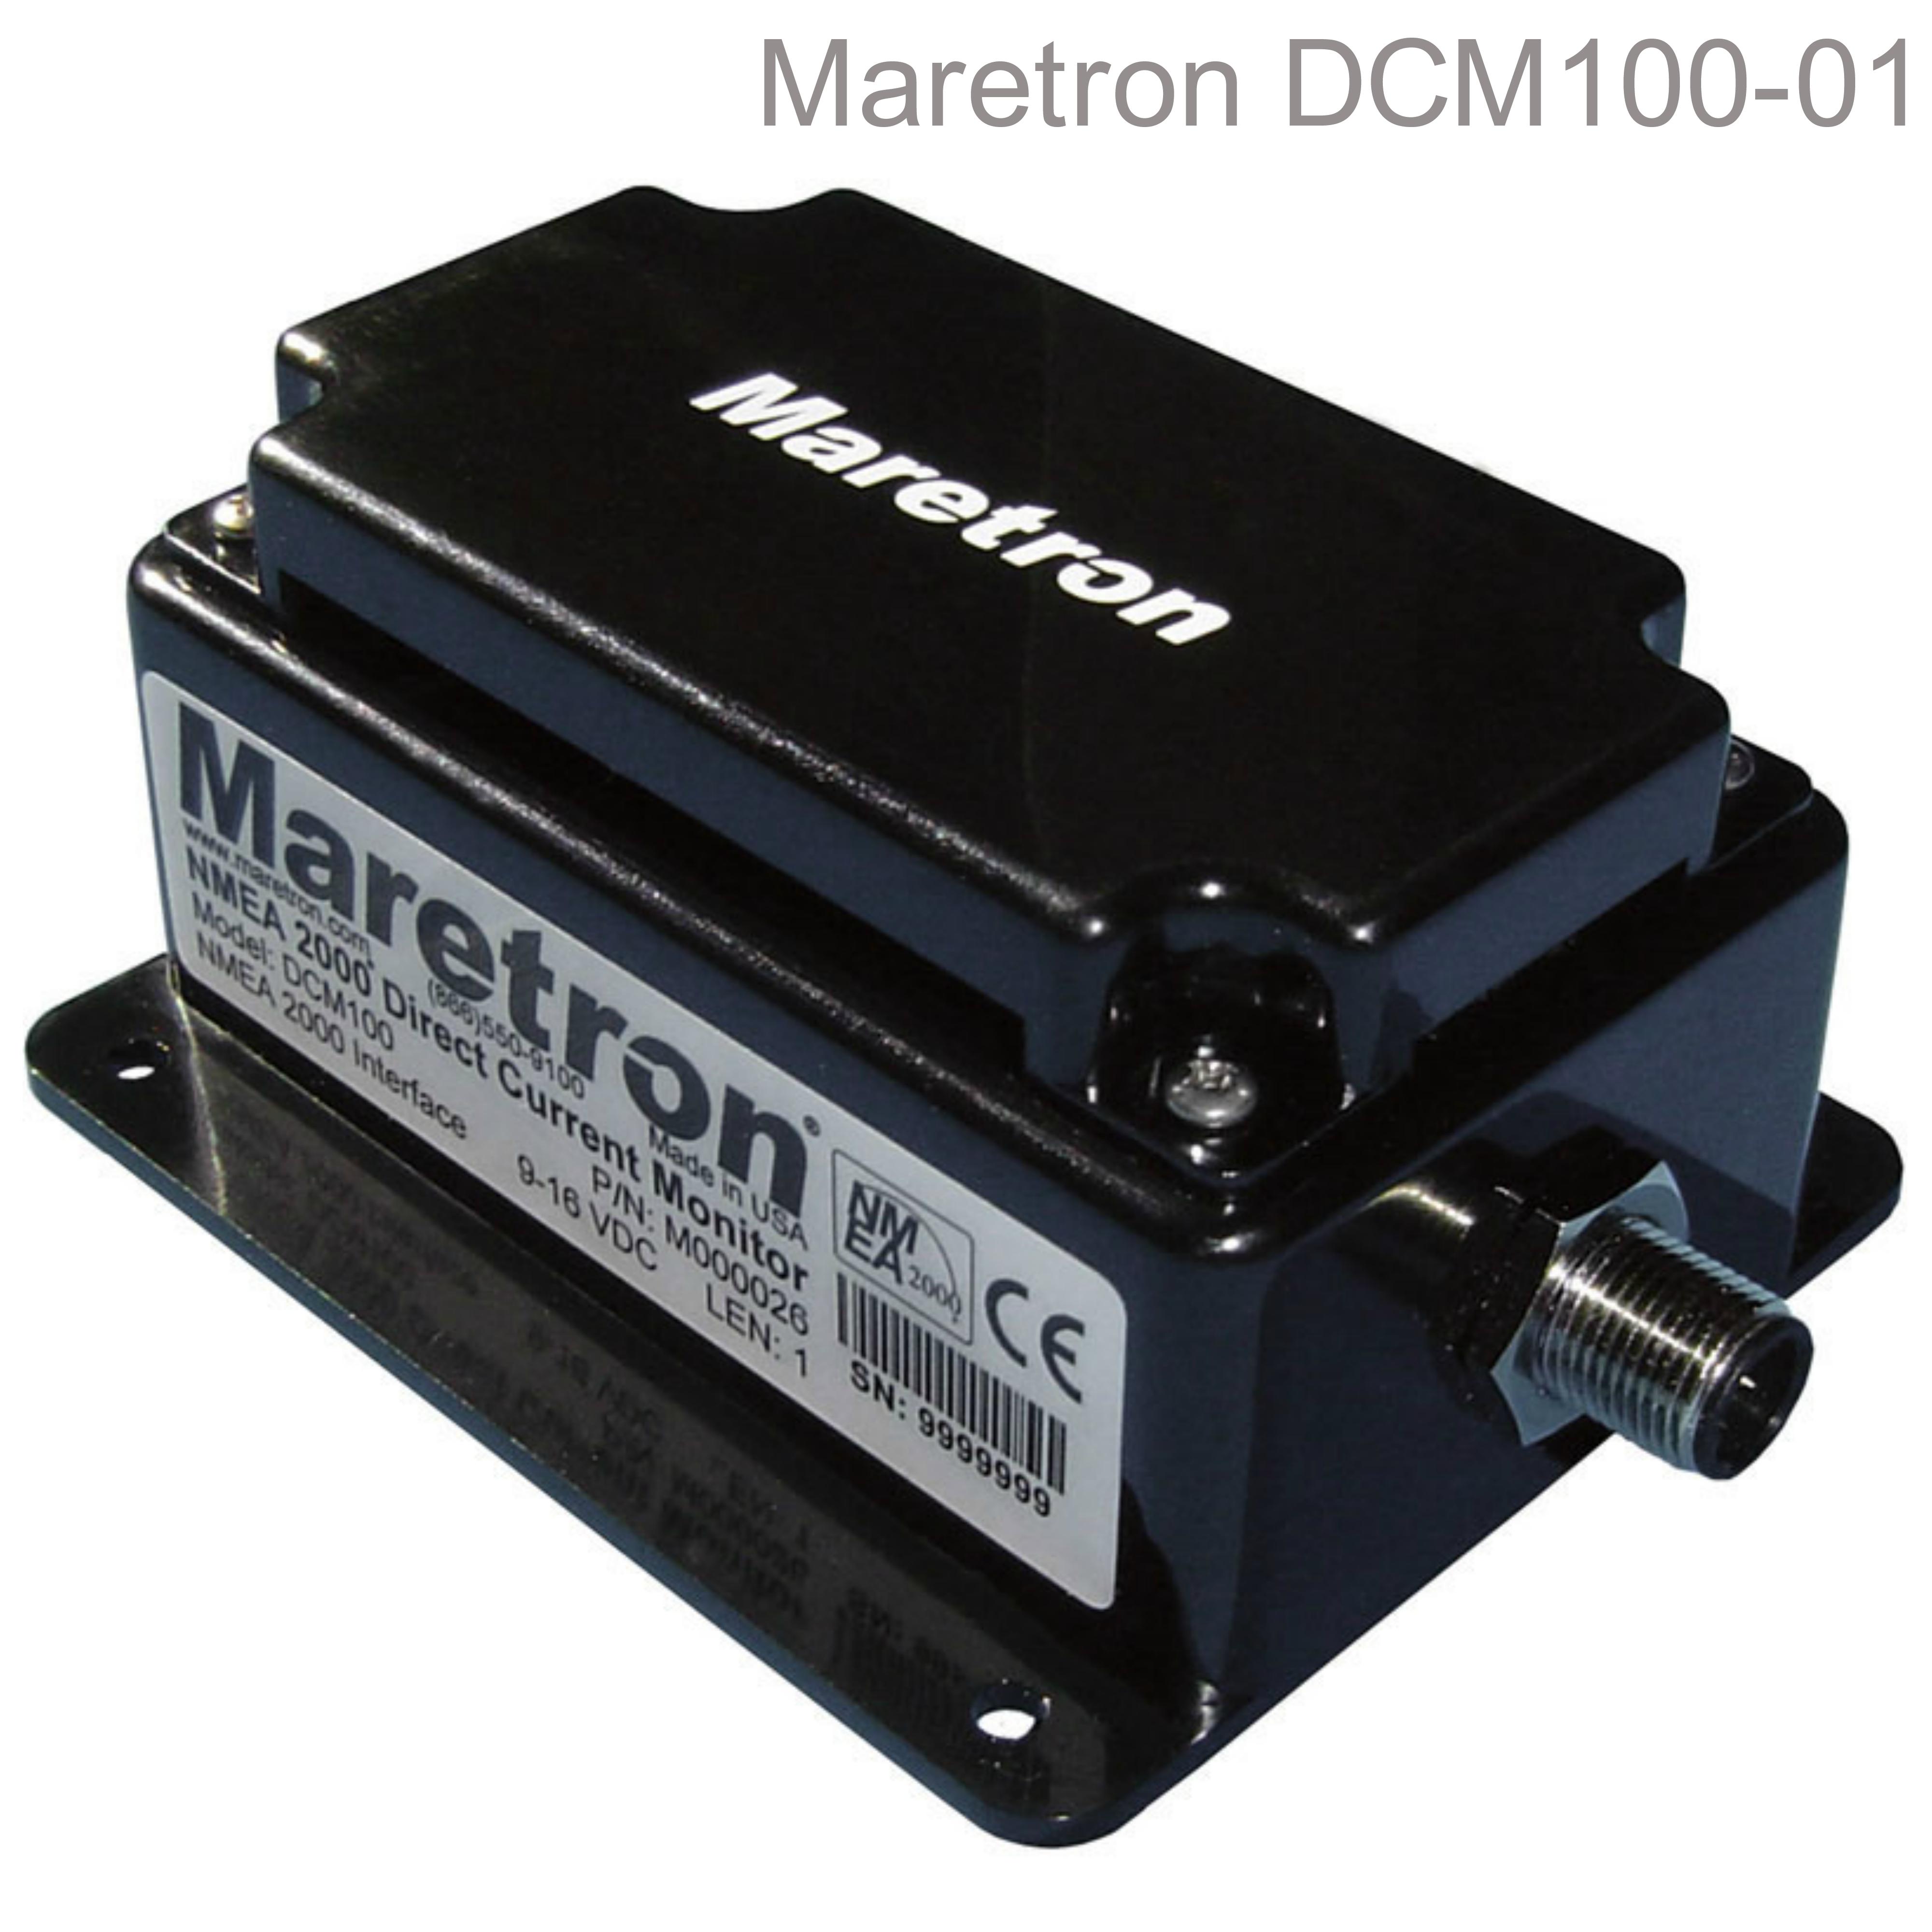 Find Voltage Measurement Detectors Shop Every Store On The Internet Ac Detector Tester For Electrician Circuit Breakers 675220 468dcm10001 Dcm100 N2kview